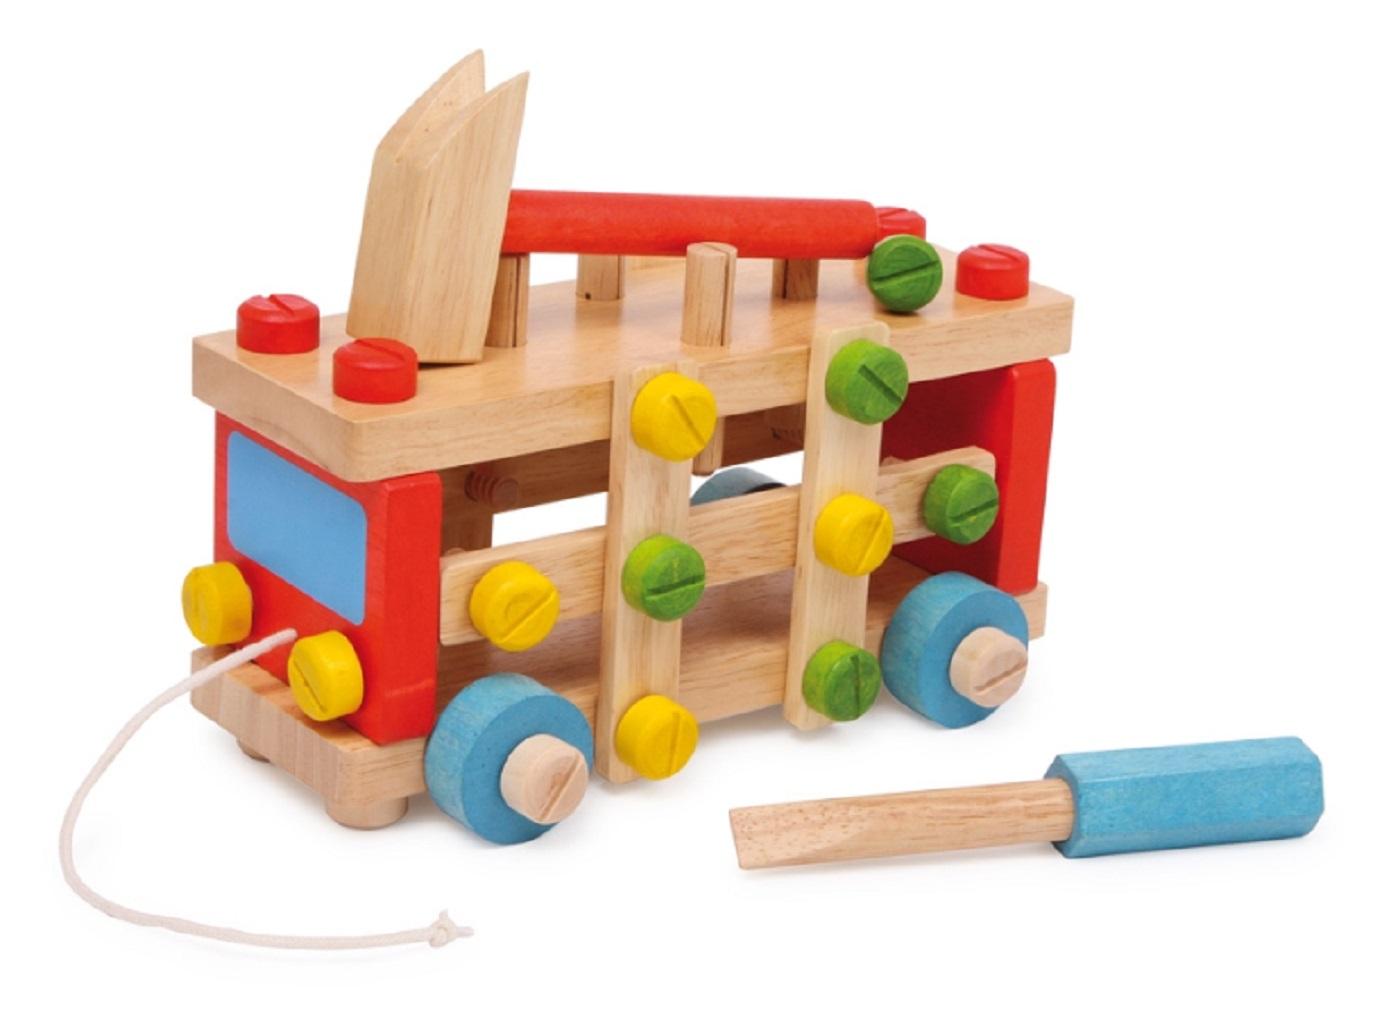 Wooden Construction Toys : Wooden construction vehicle set